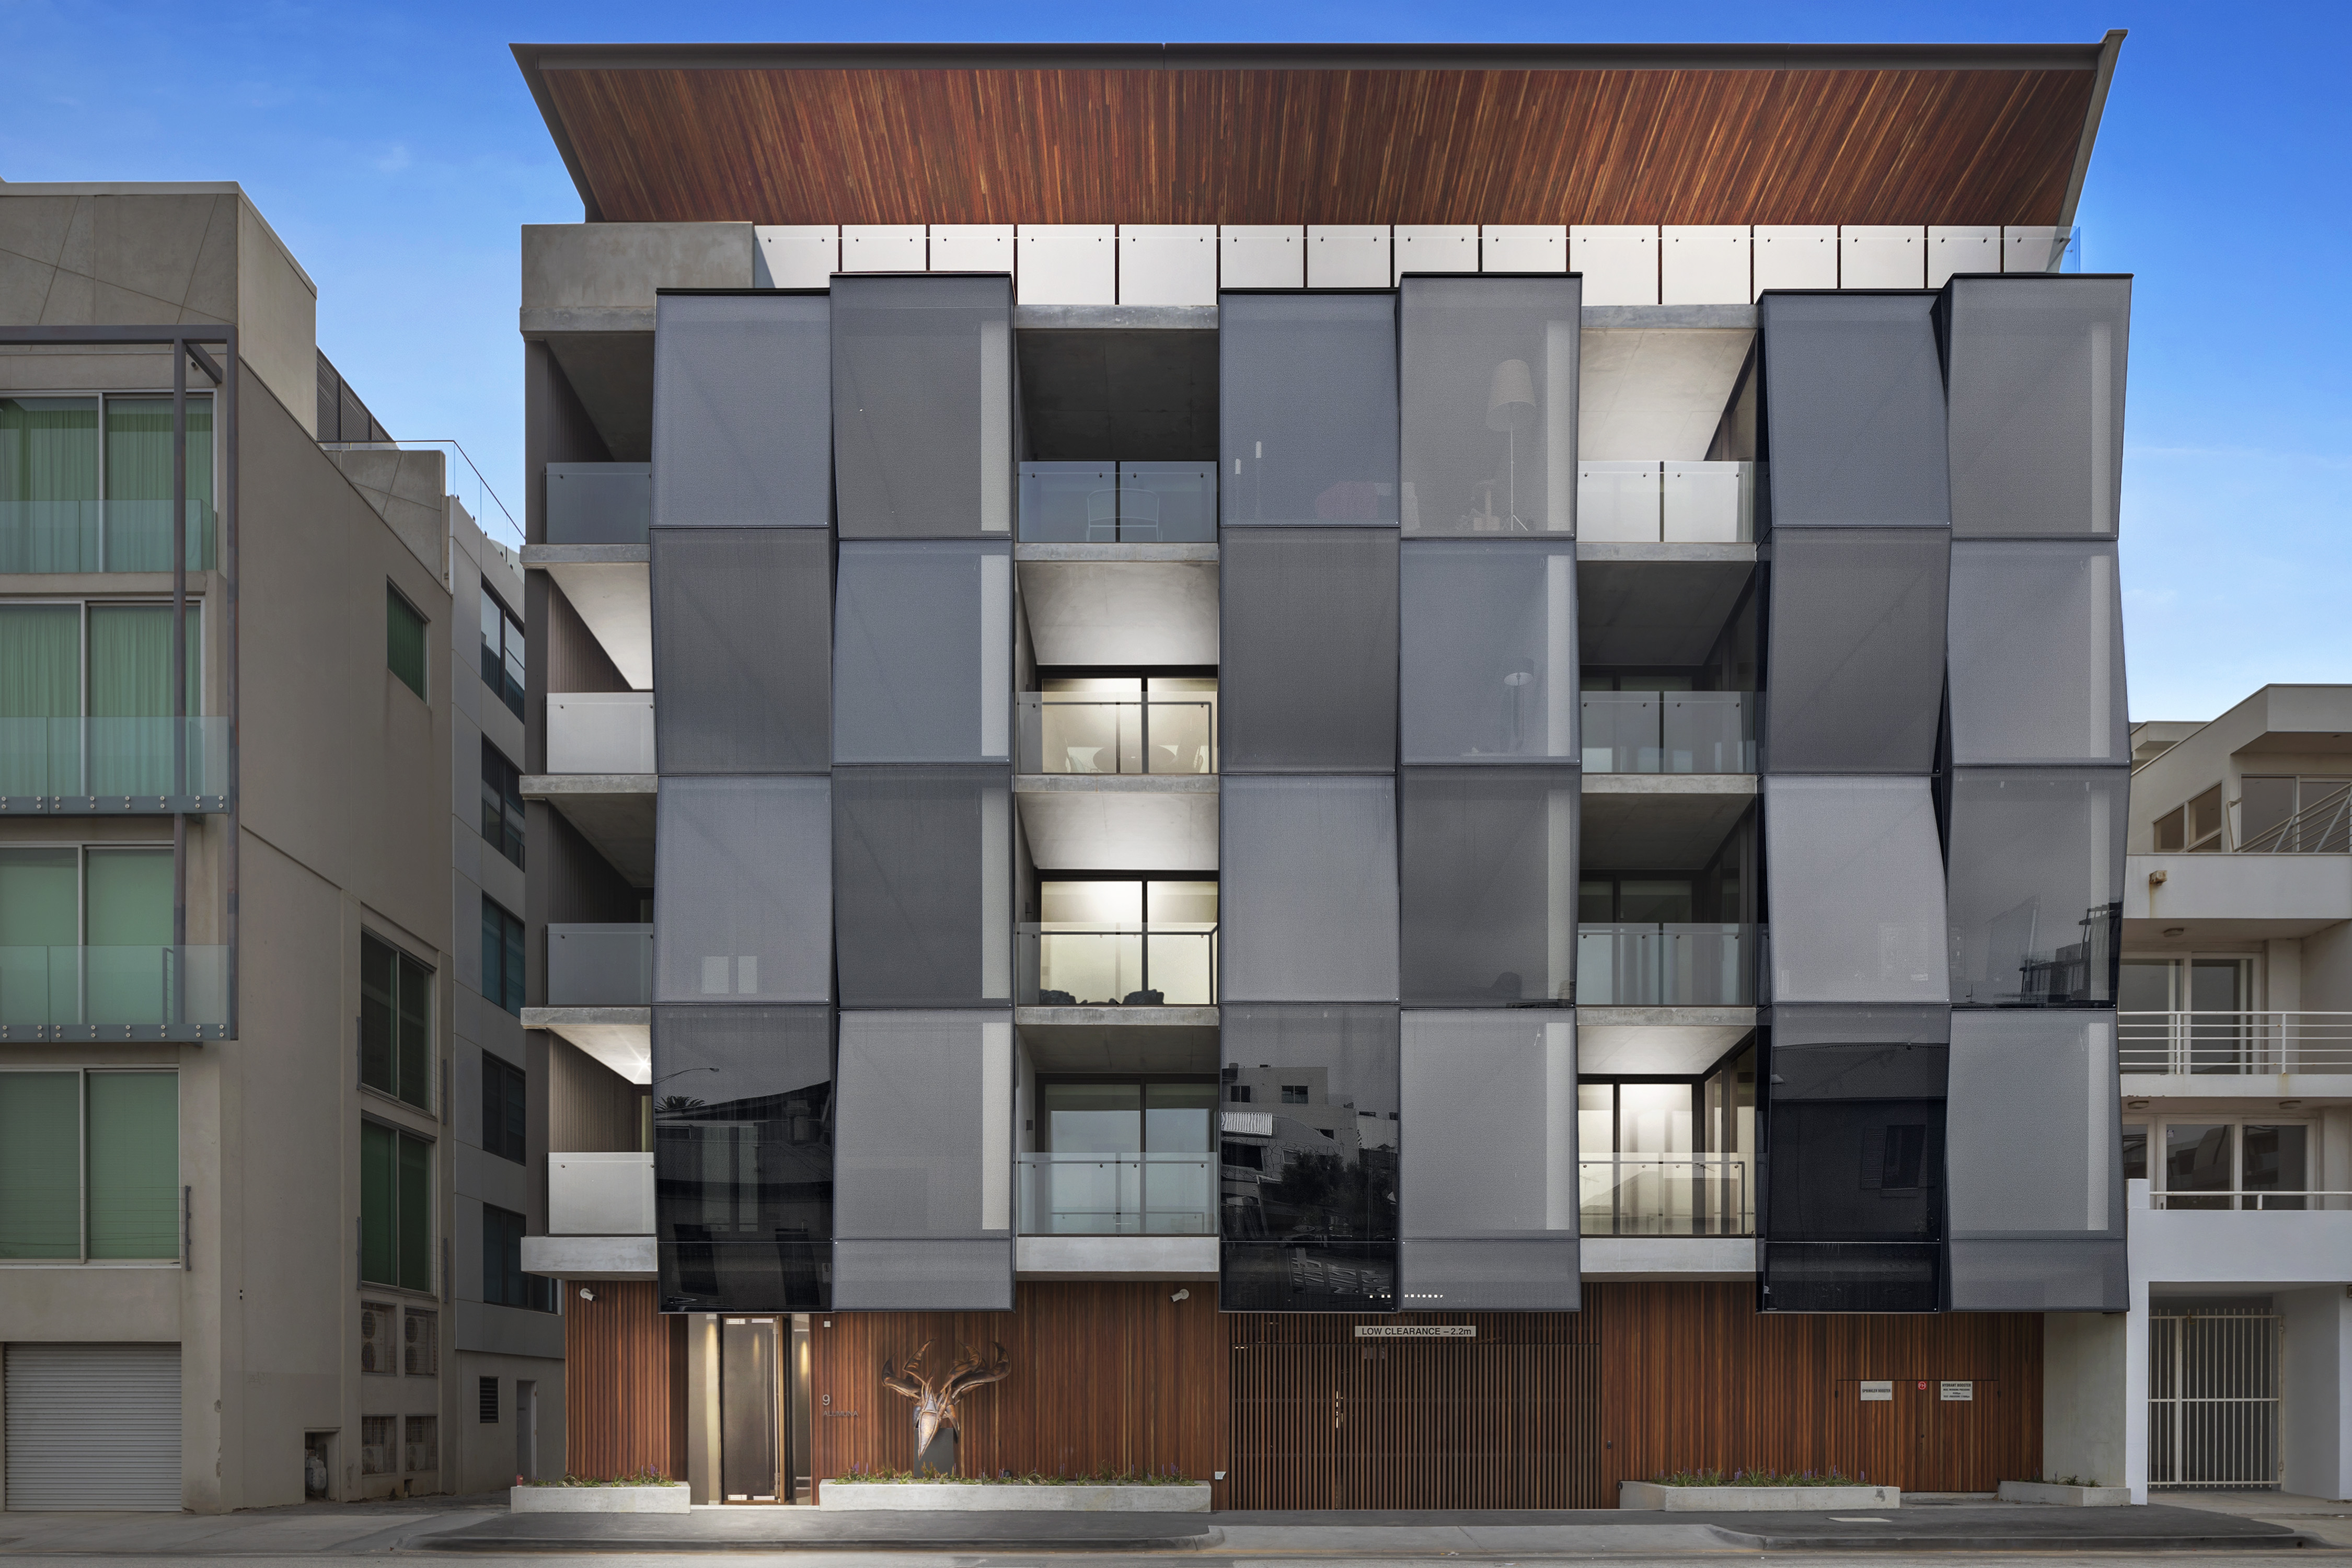 405-9-johnston-street-port-melbourne-student-accommodation-Melbourne-Exterior-Unilodgers